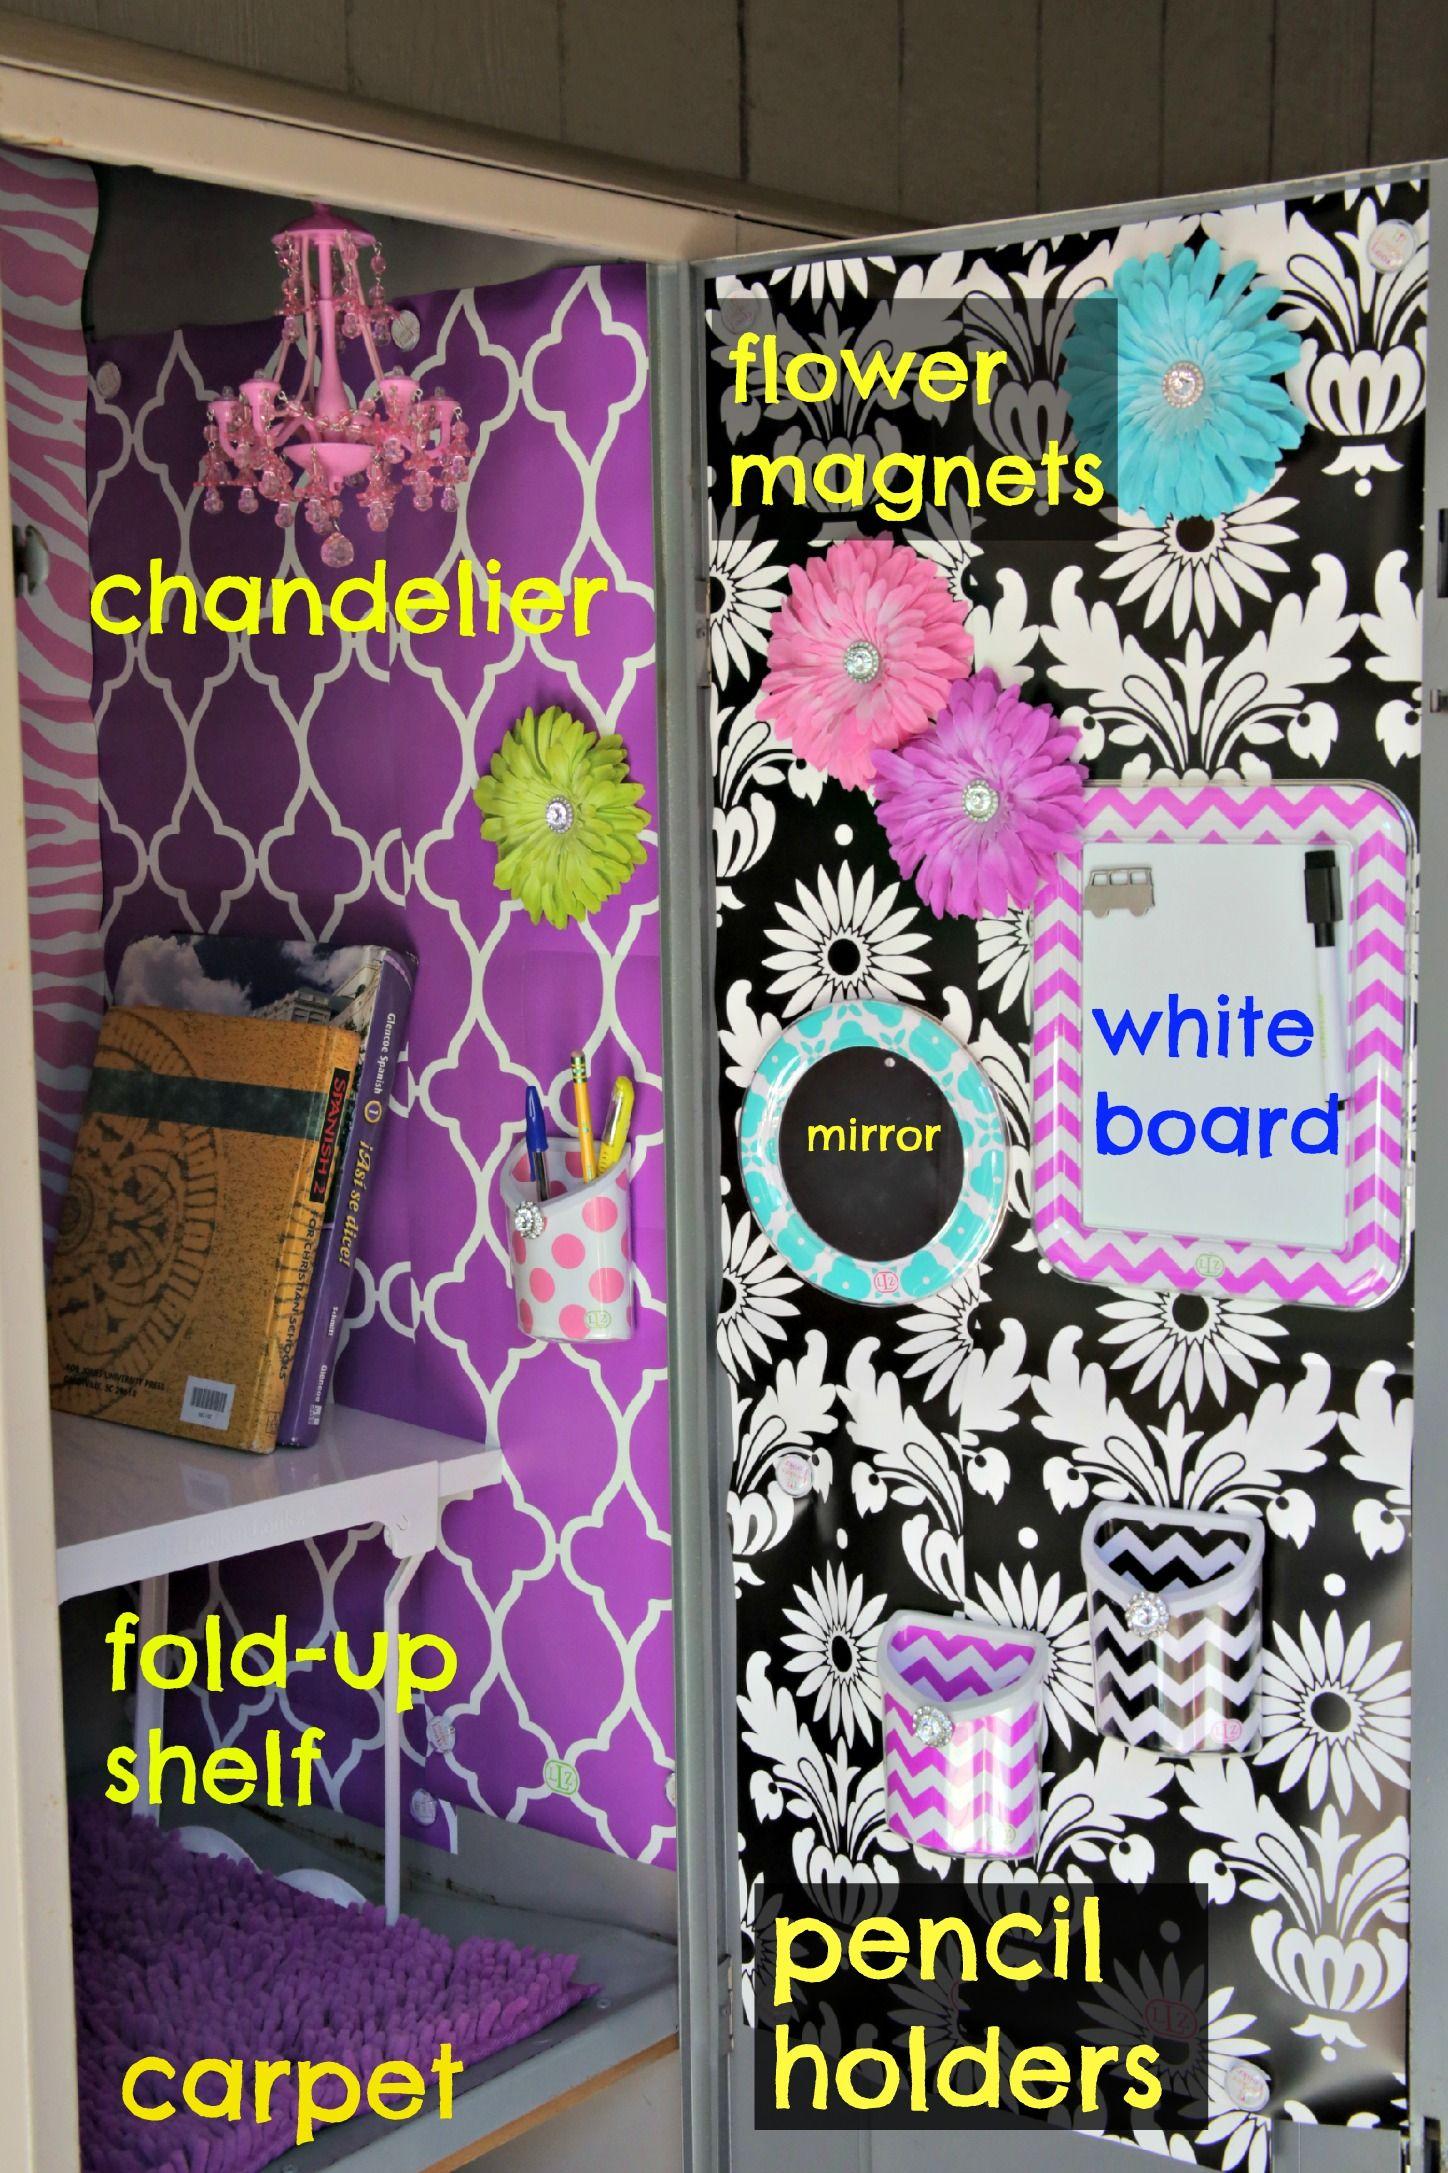 Locker Designs Ideas creative locker decorating ideas Find This Pin And More On Locker Decorating Ideas